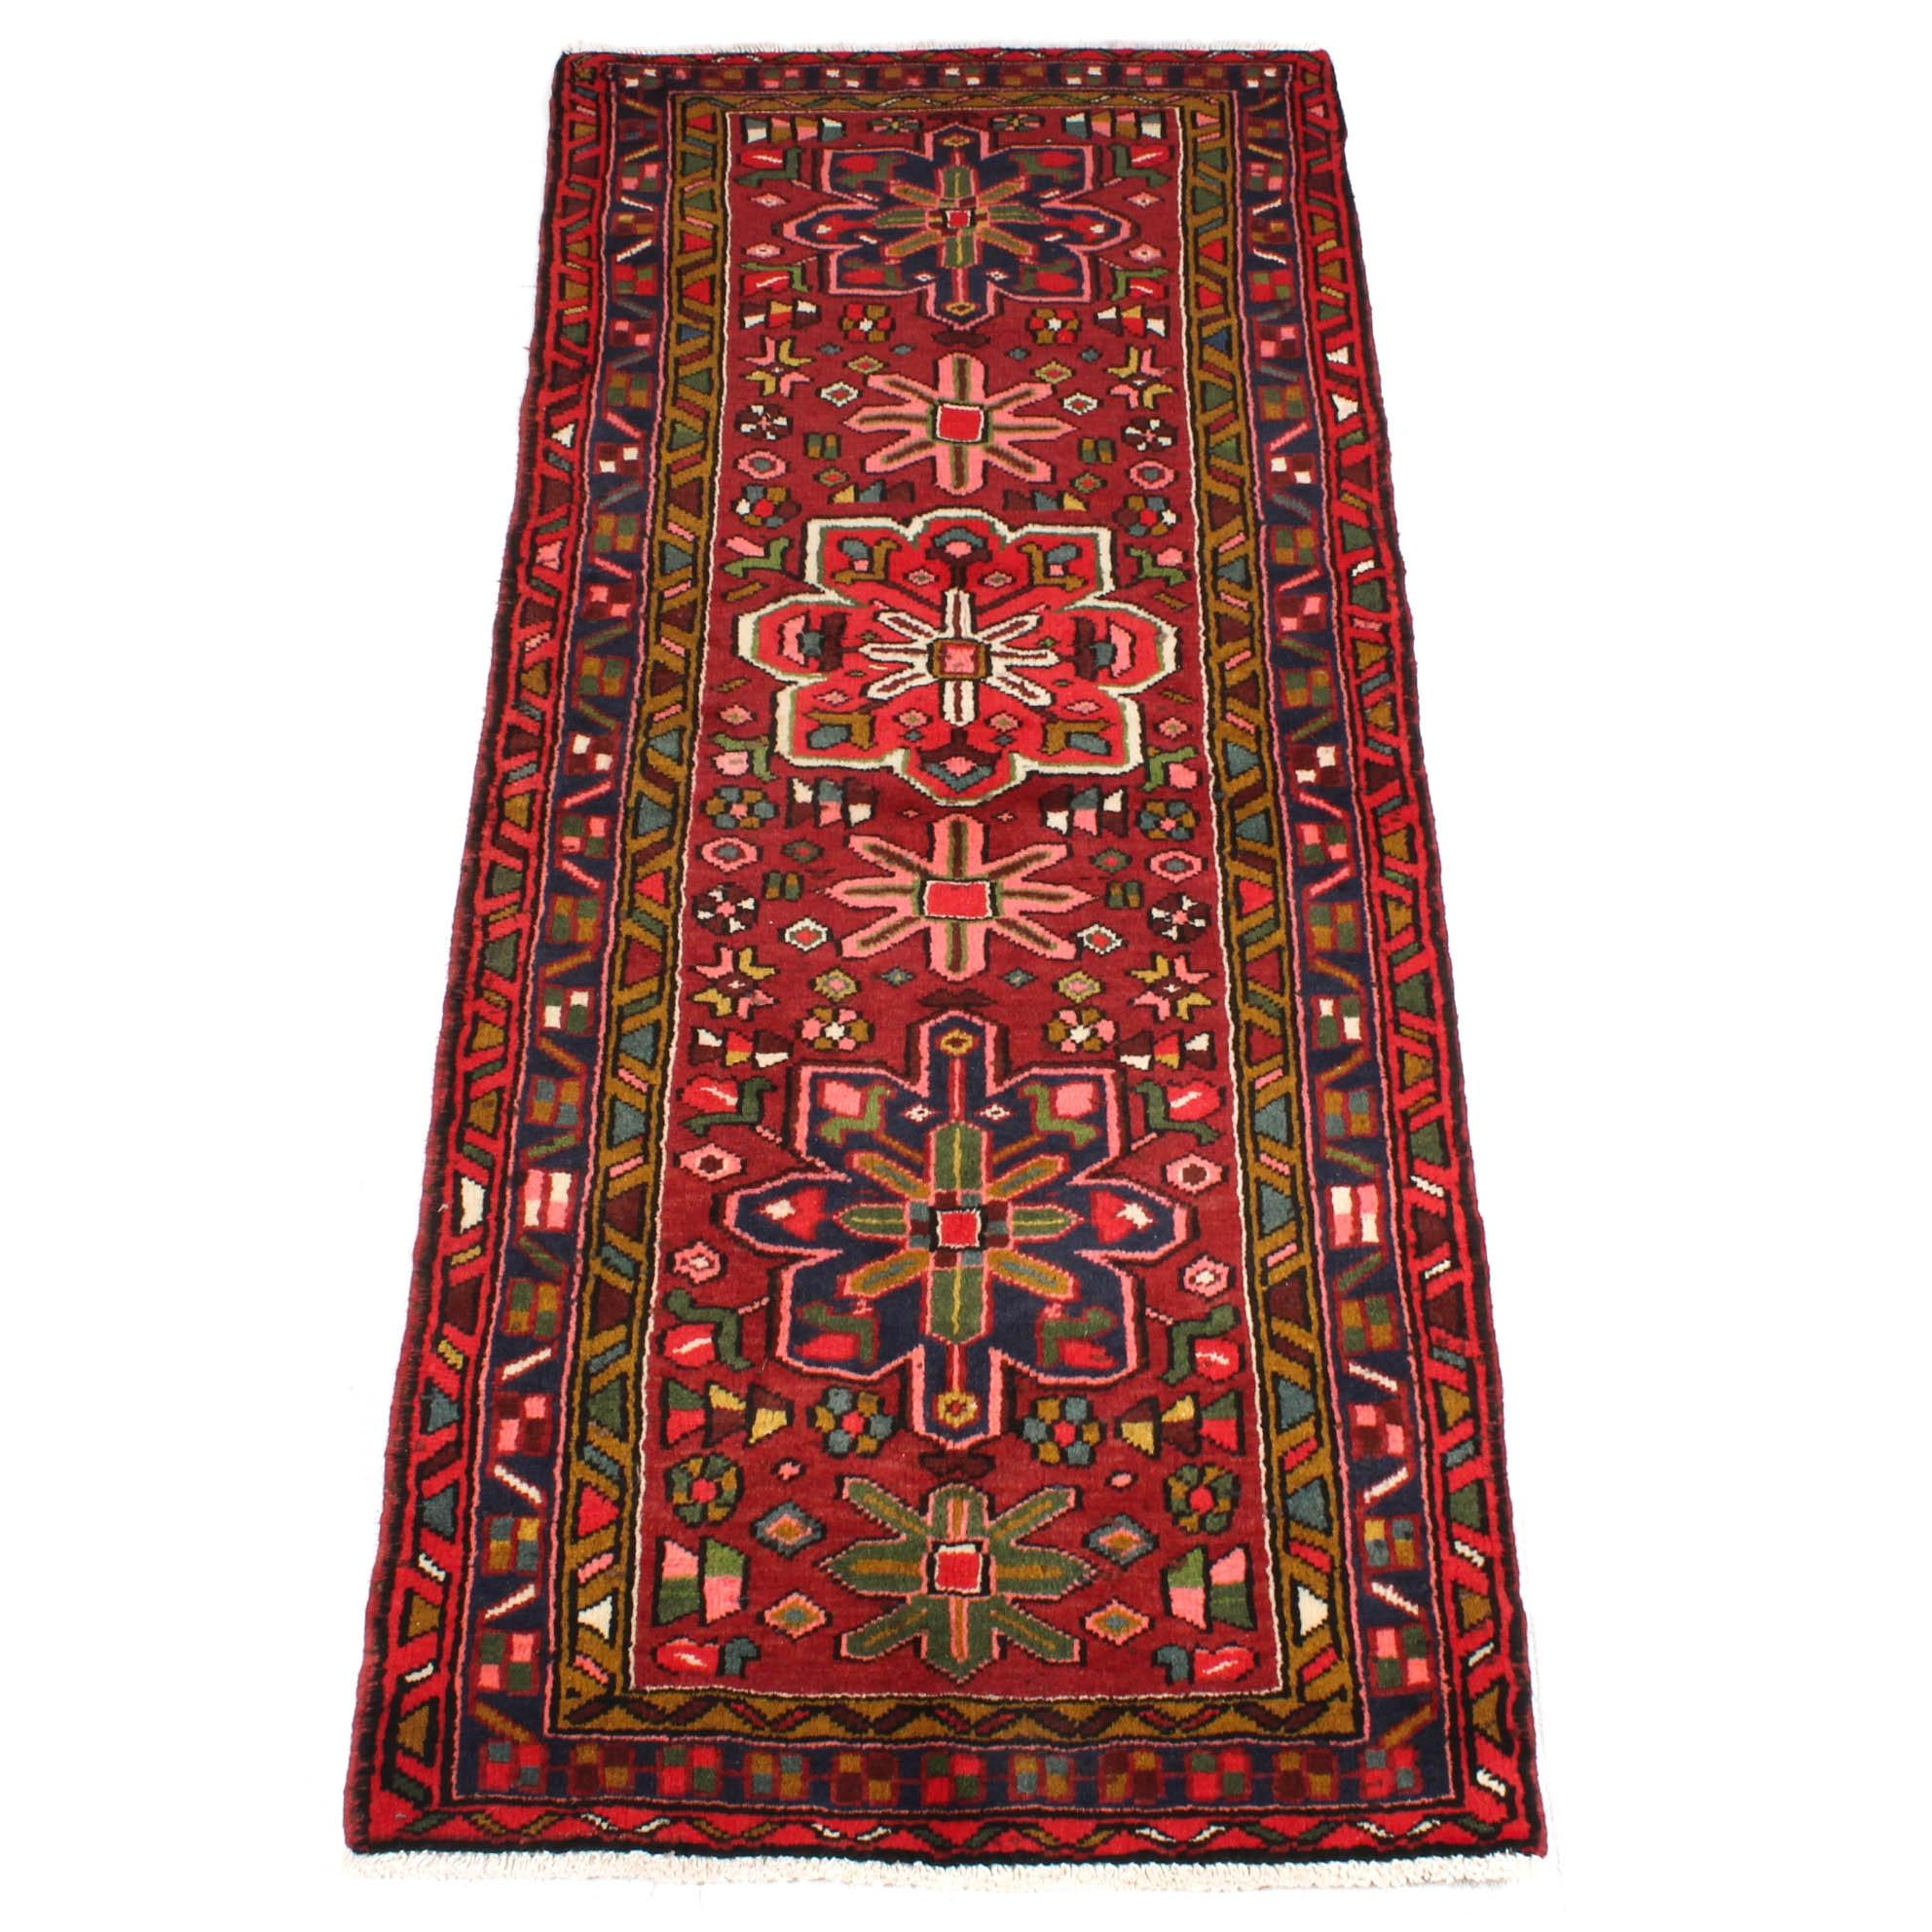 2'8 x 6'4 Hand-Knotted Persian Lamberan Runner